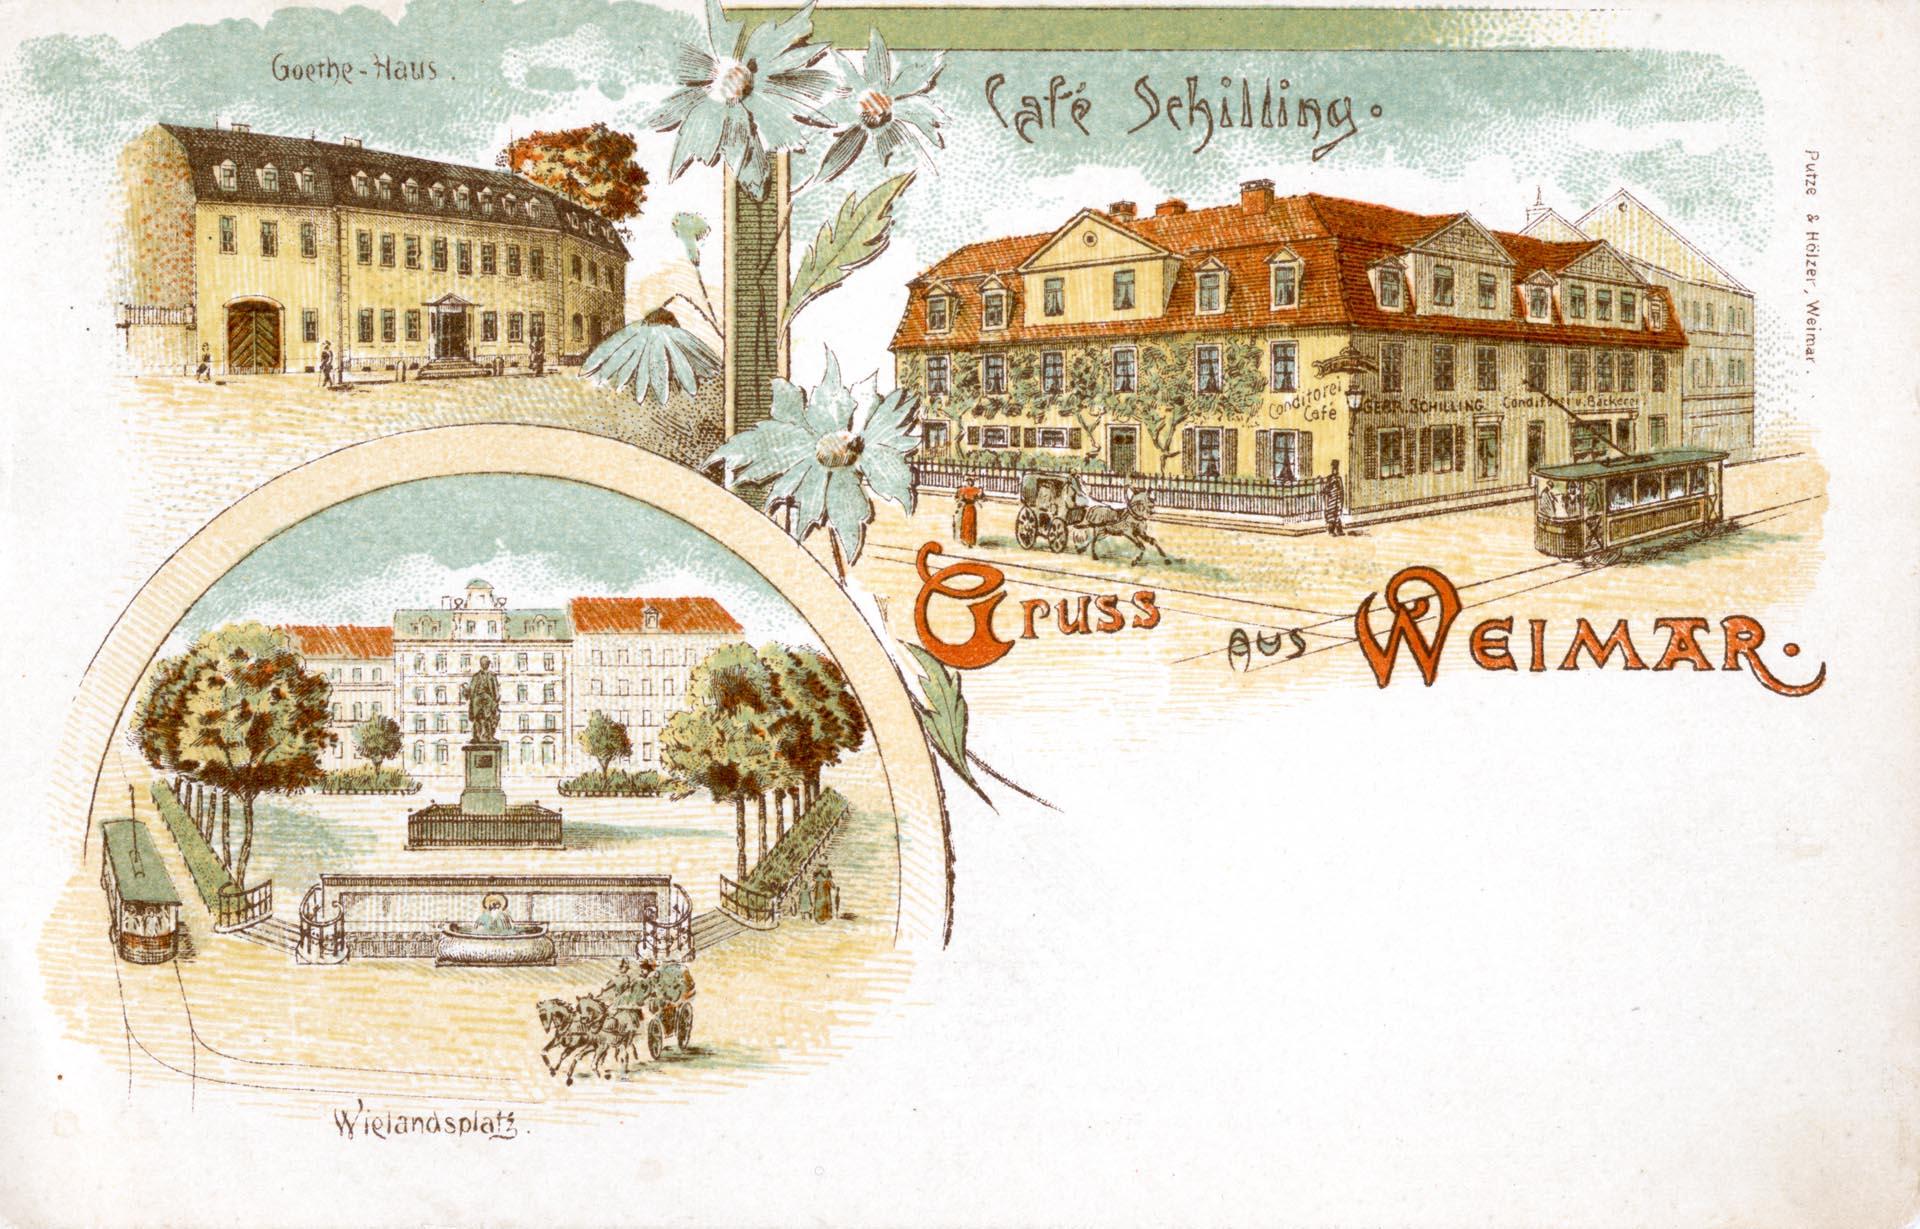 Cafe Schilling - Goethe Haus - Wielandplatz